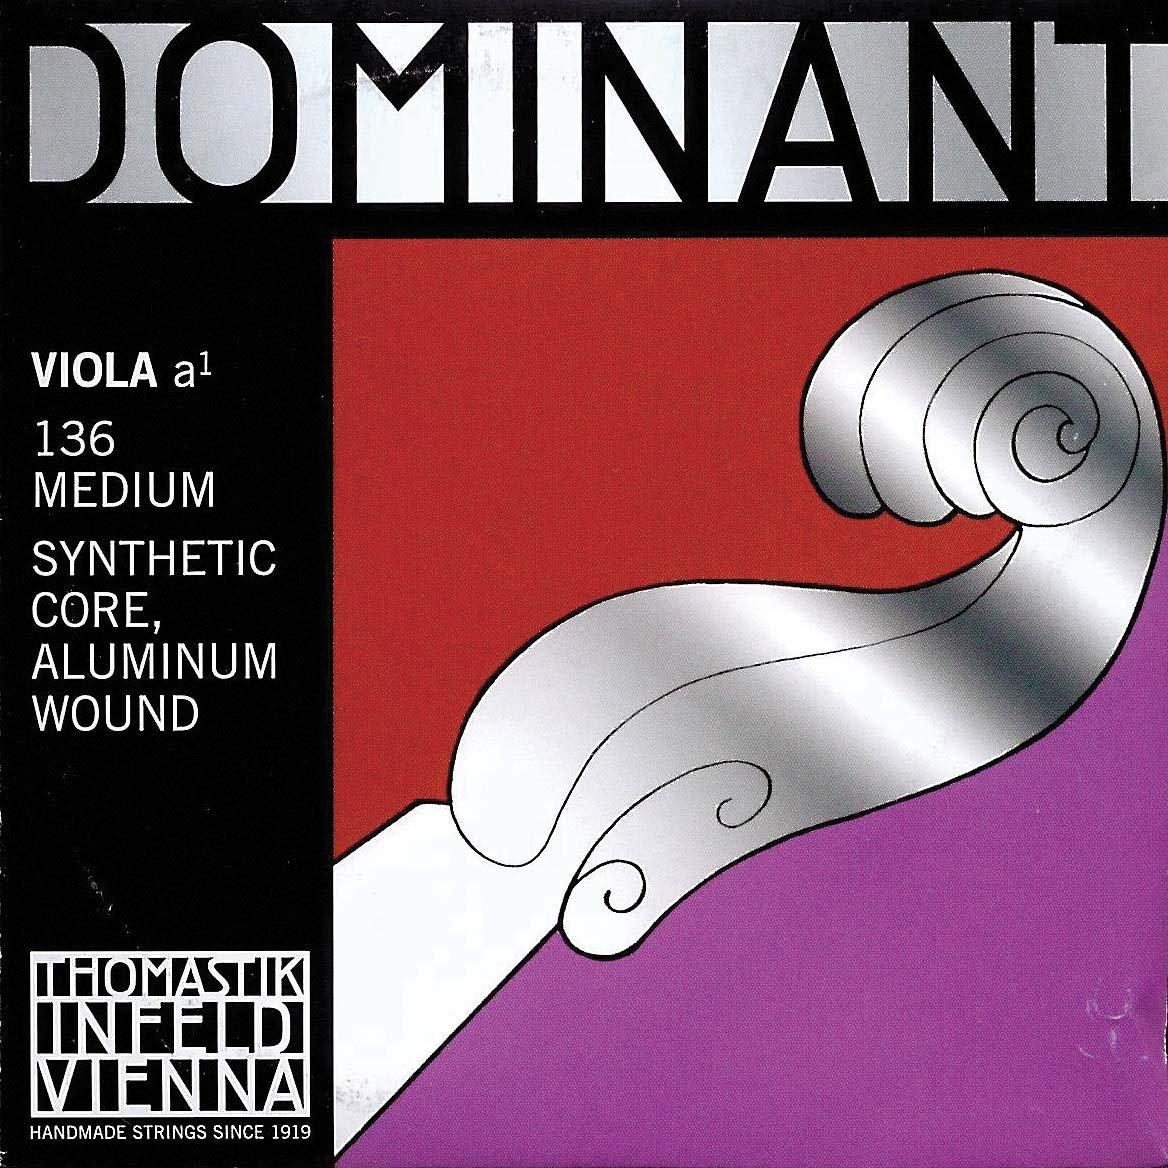 Dominant 15''-16'' Viola A String - Medium Gauge - Aluminum Wound Perlon Core - Thomastik Infeld